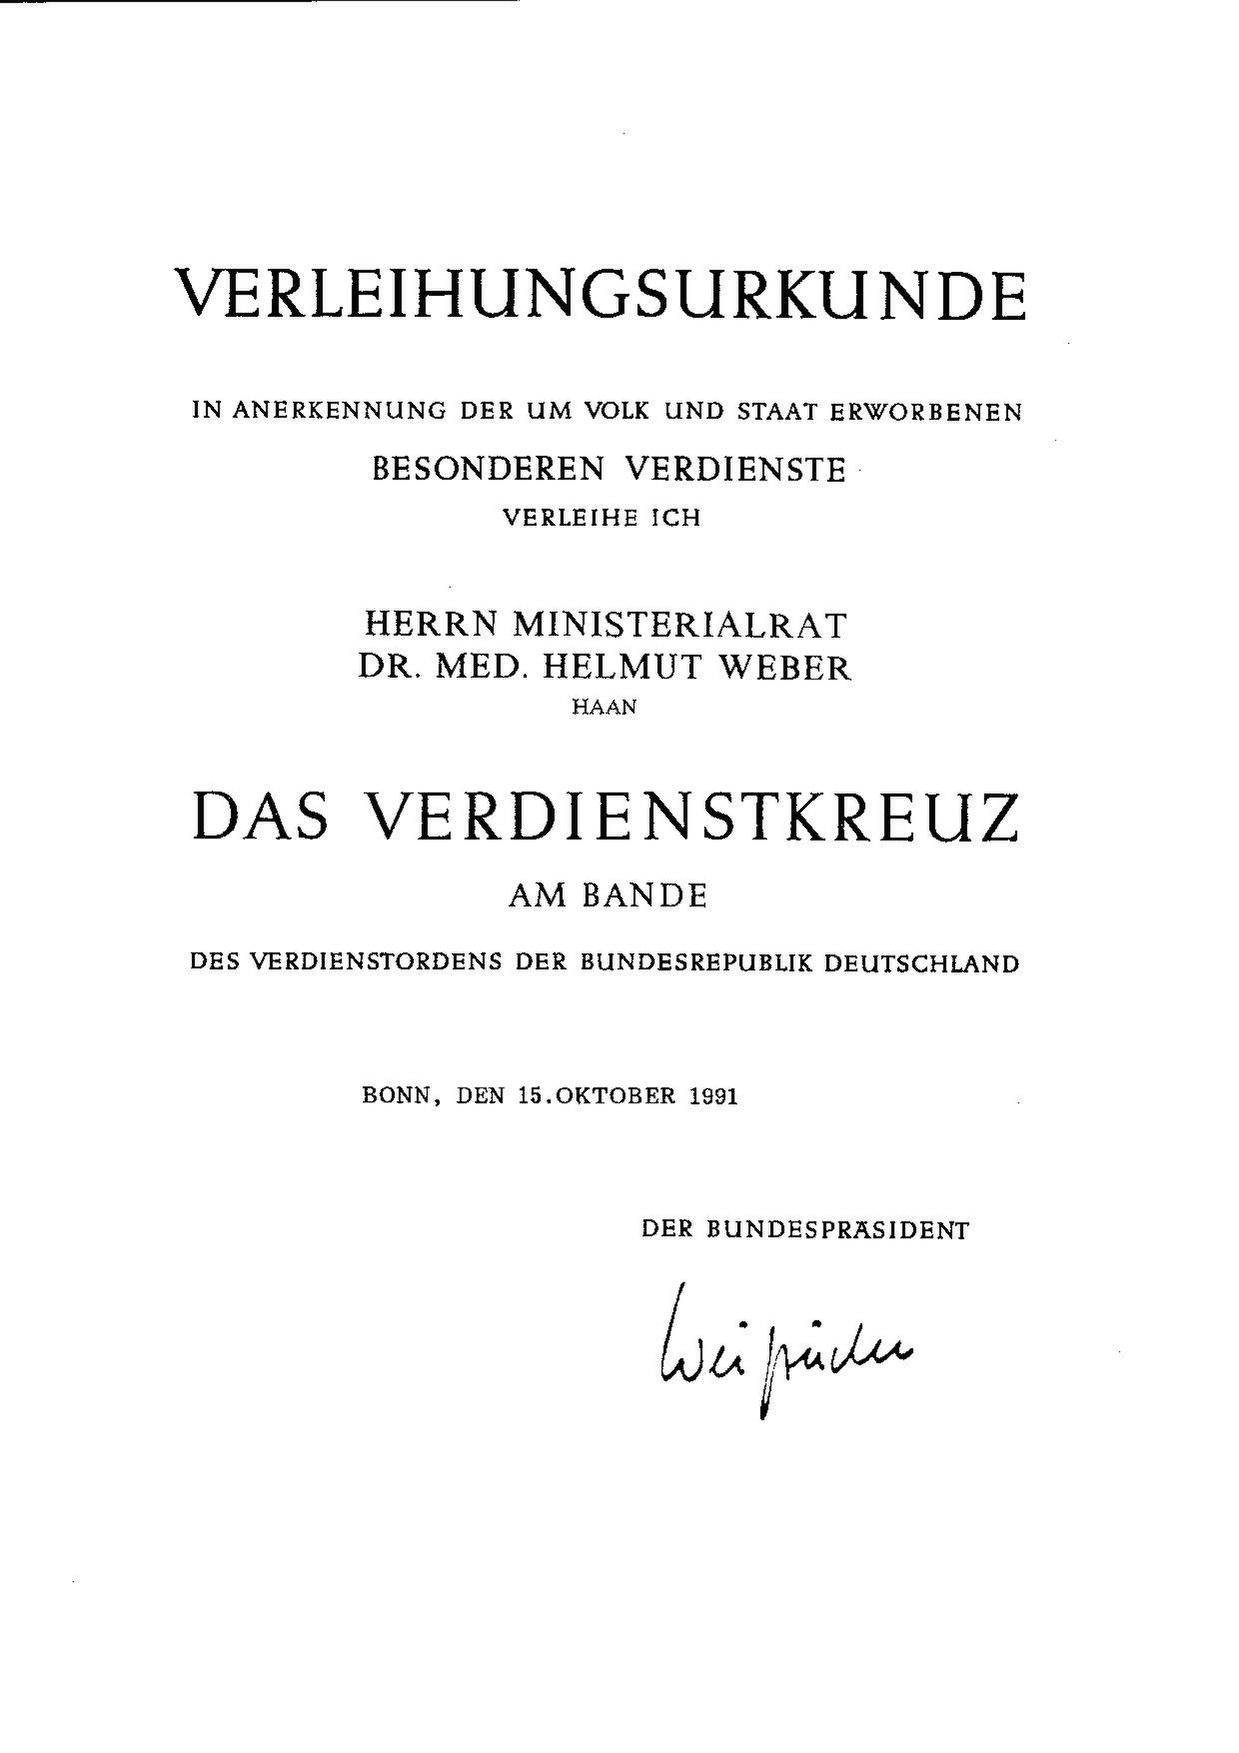 Datei:Verleihungsurkunde Dr. Weber.pdf – Wikipedia